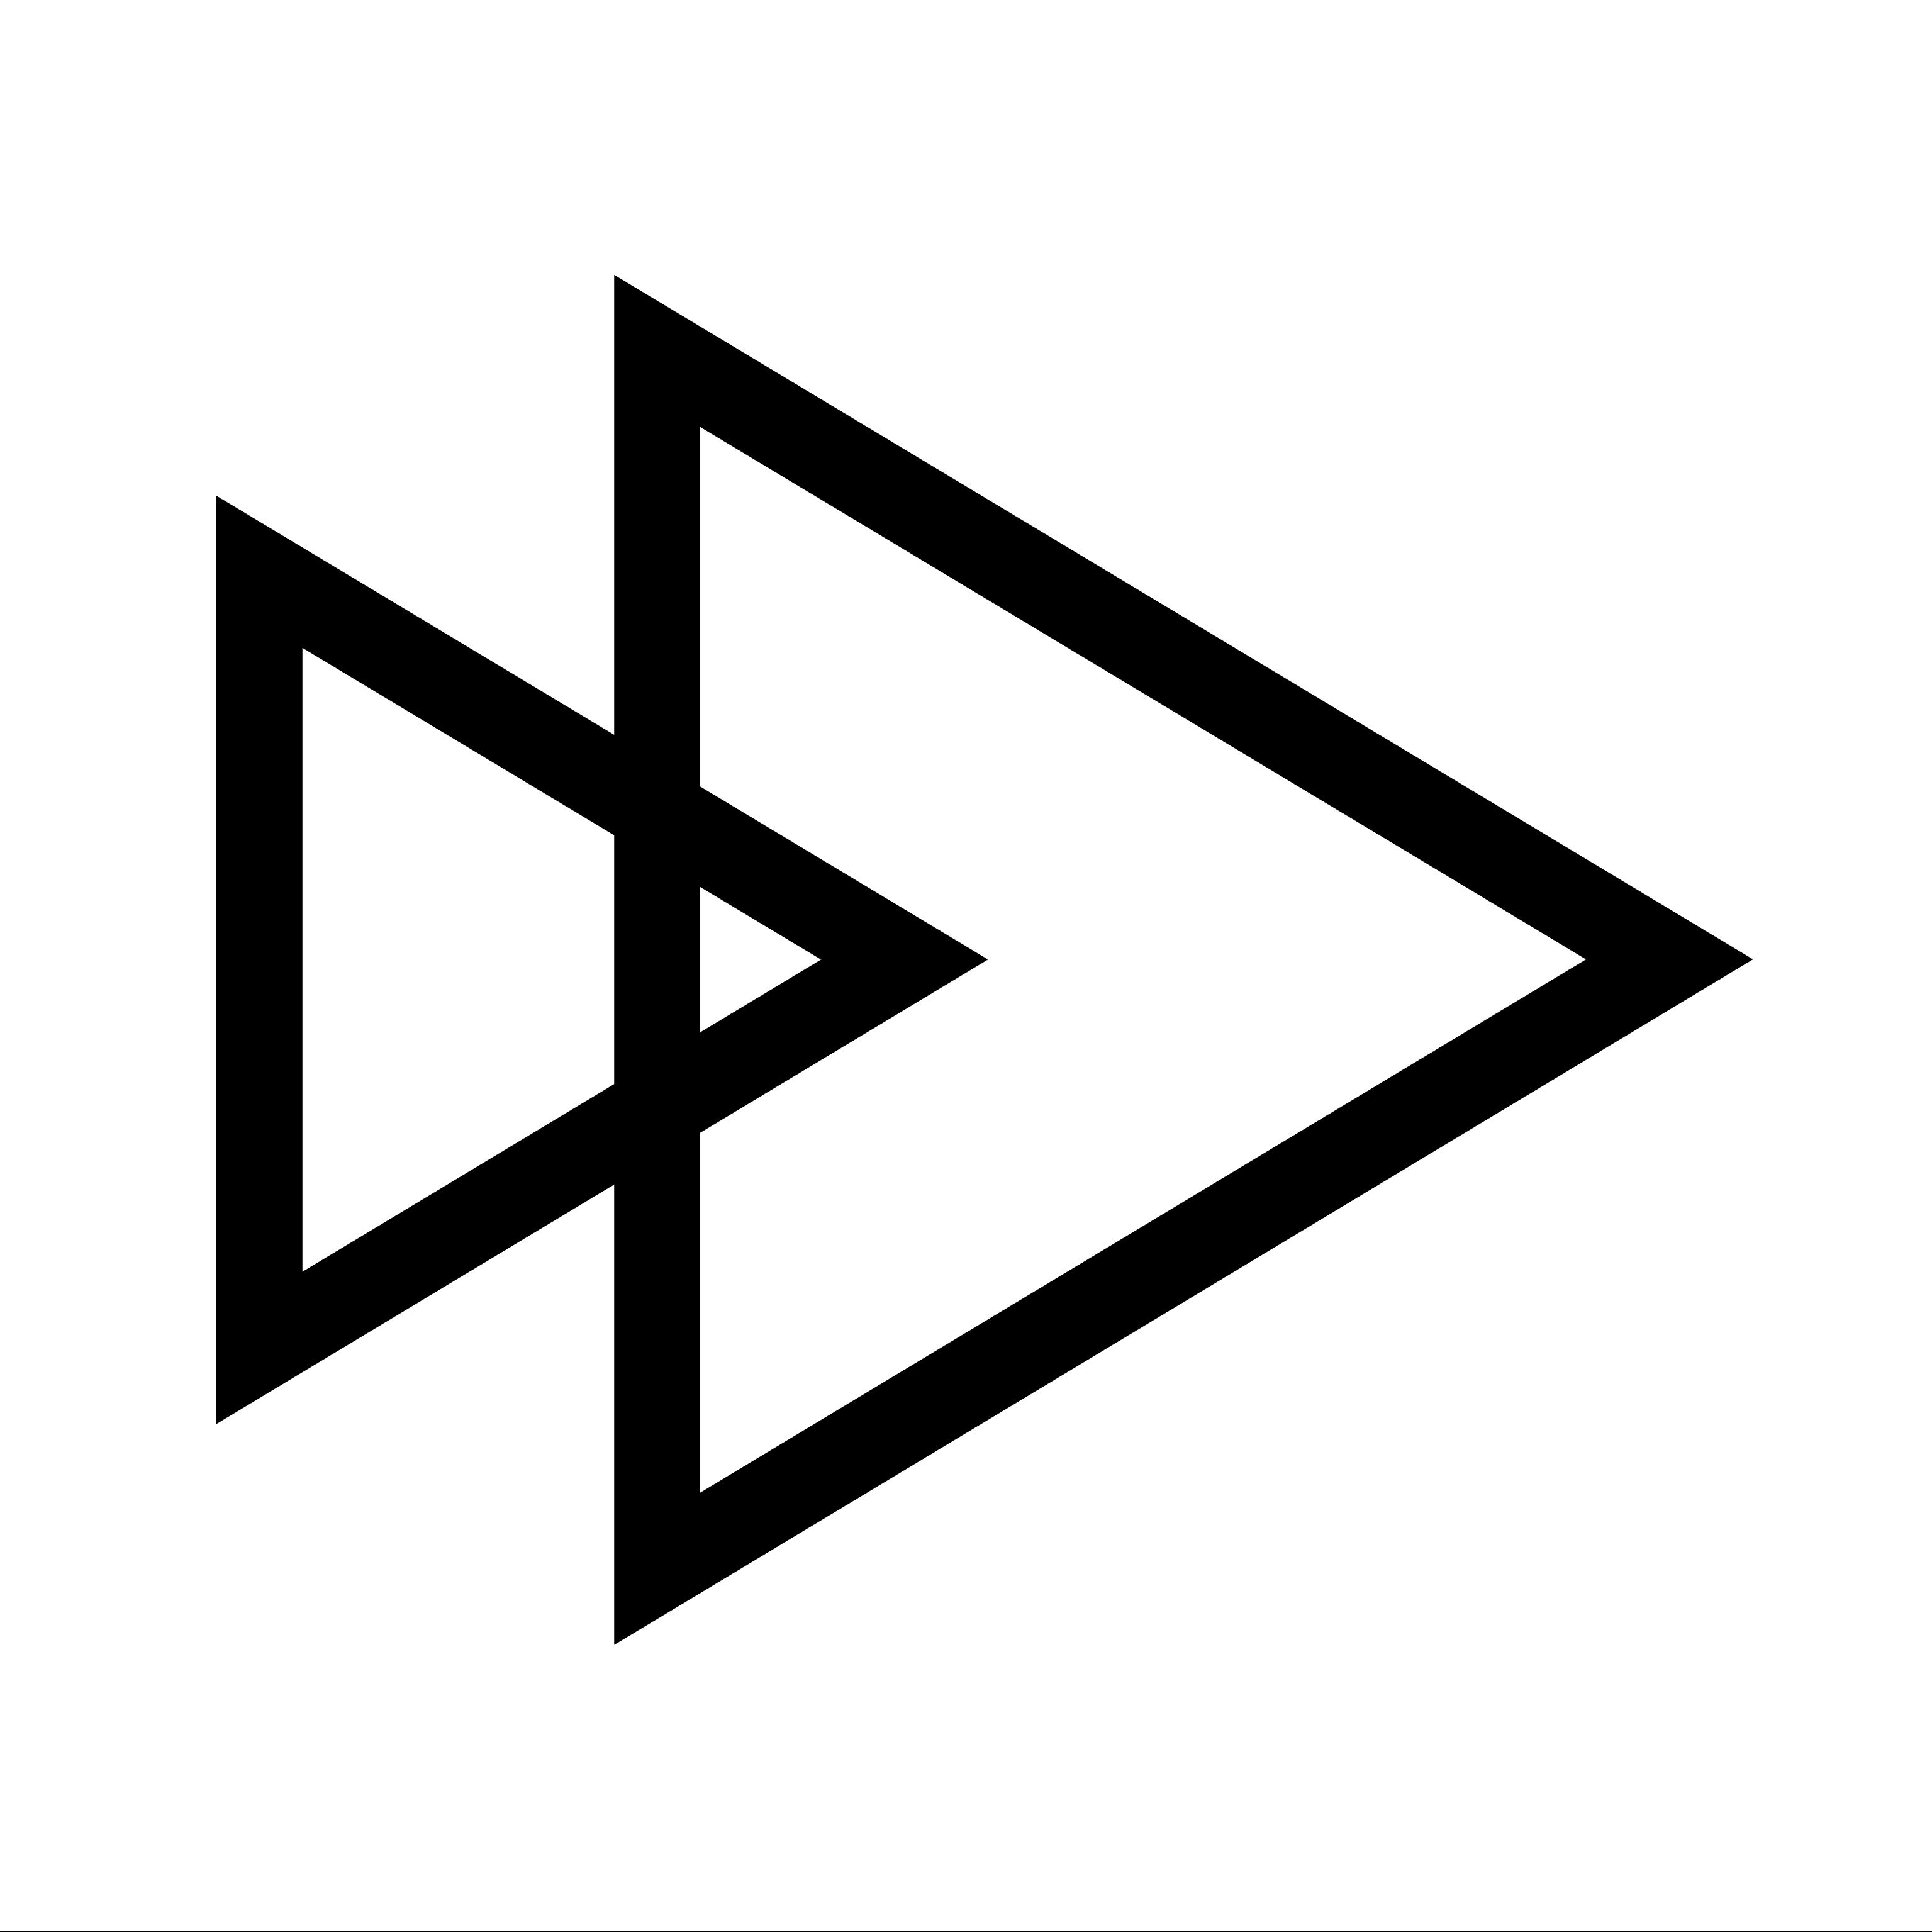 PHRUU_Triangle_2white